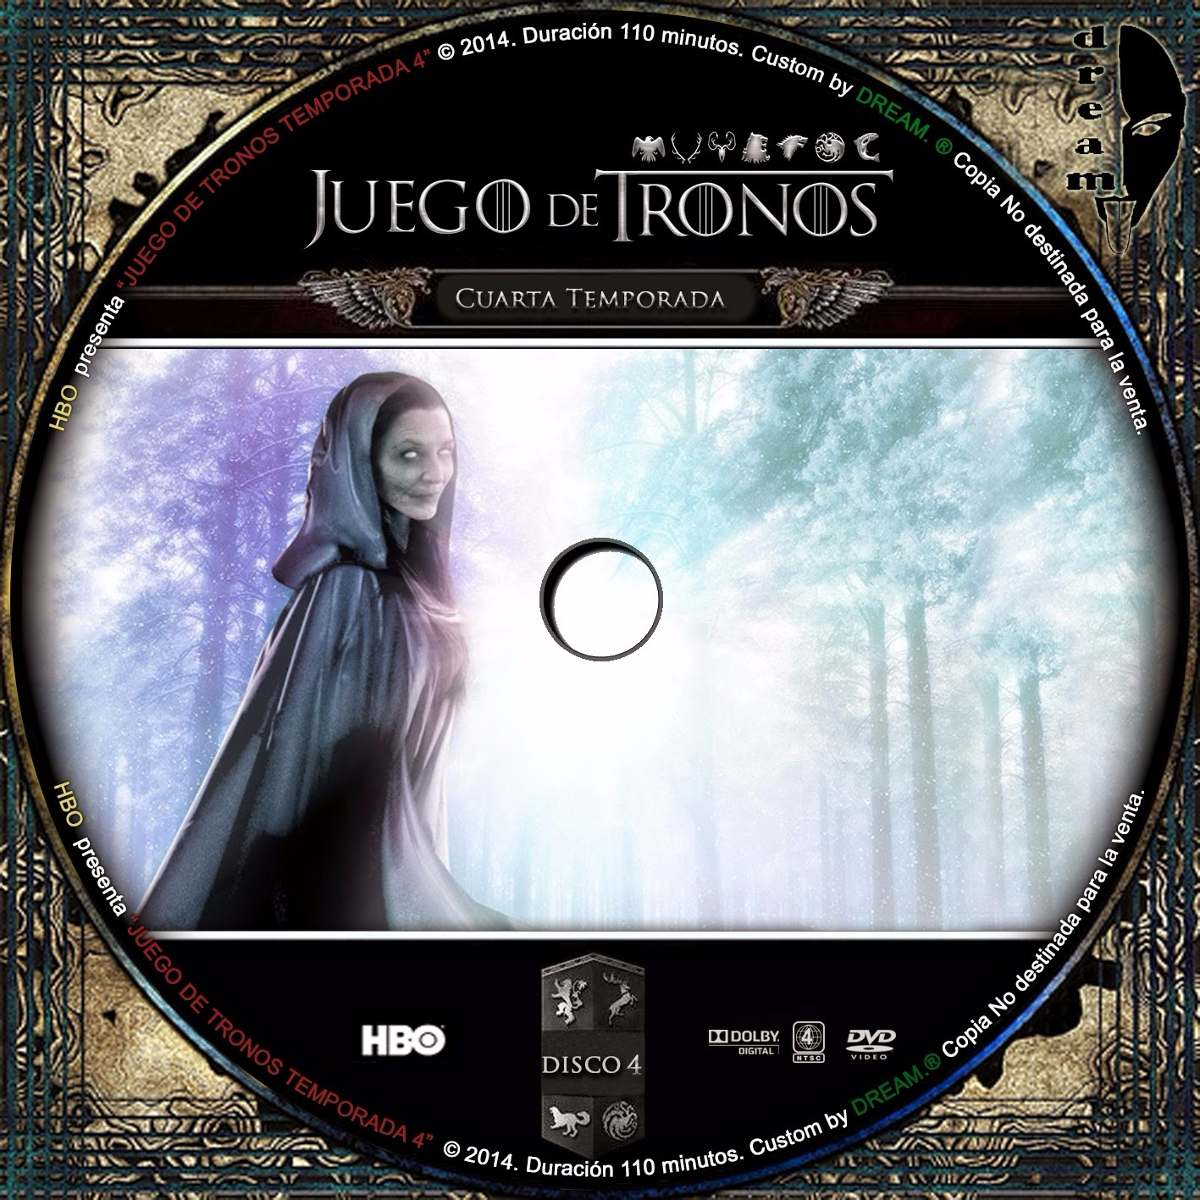 Juego De Tronos Temporada 4 Dvd Full Menu - Bs. 40.000,00 en Mercado ...